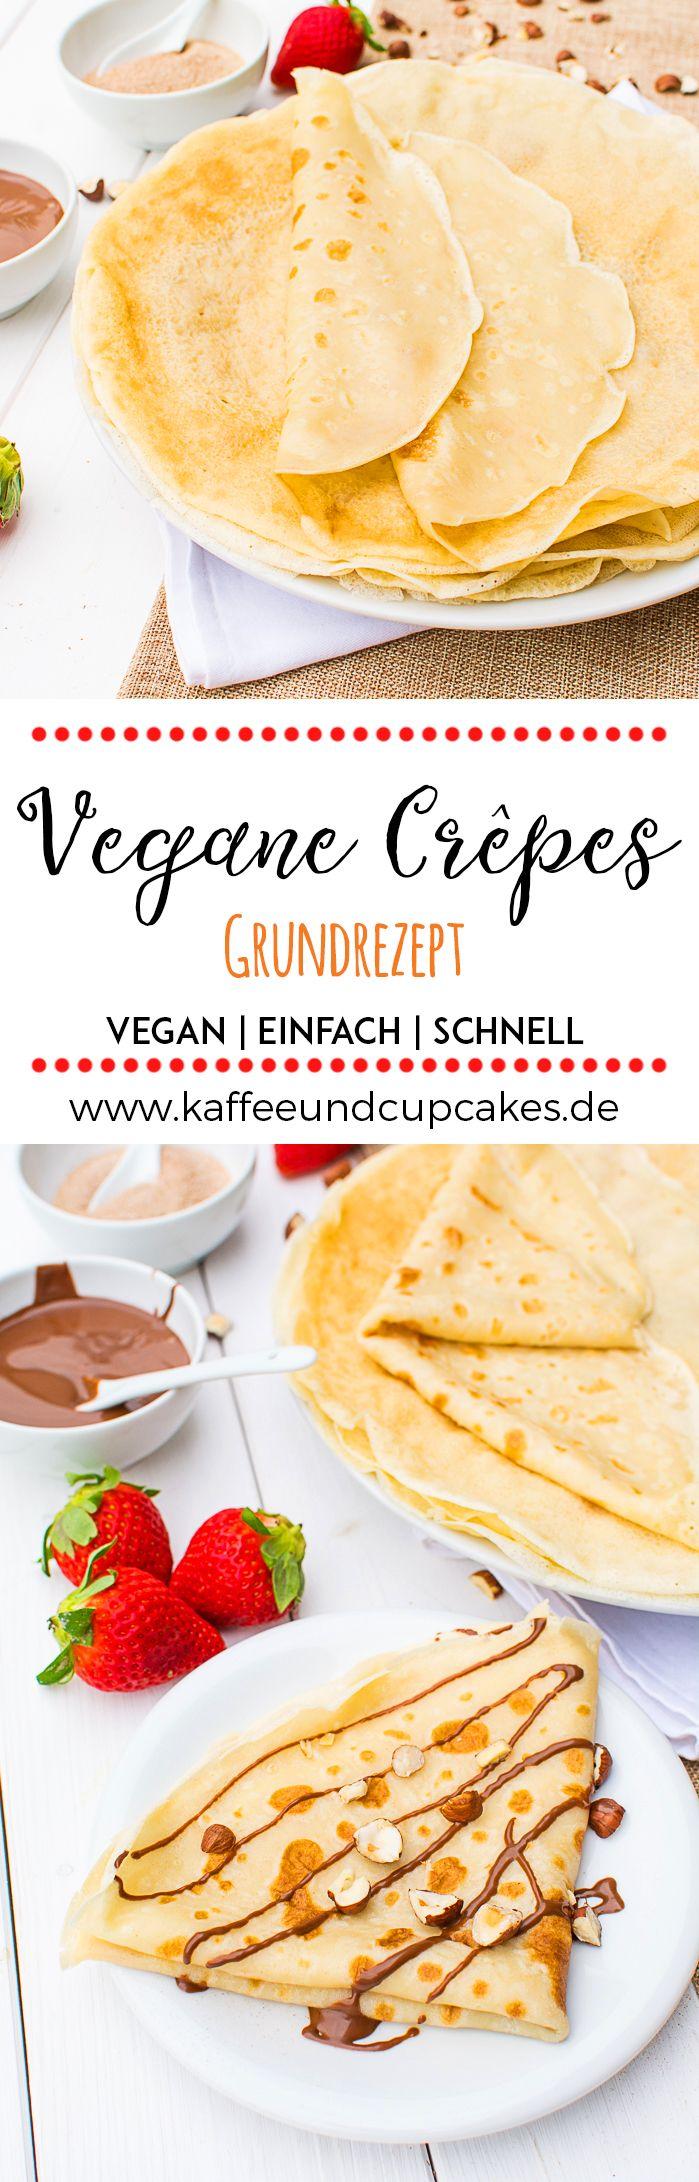 Vegane Crêpes: Grundrezept #cupcakesrezepte